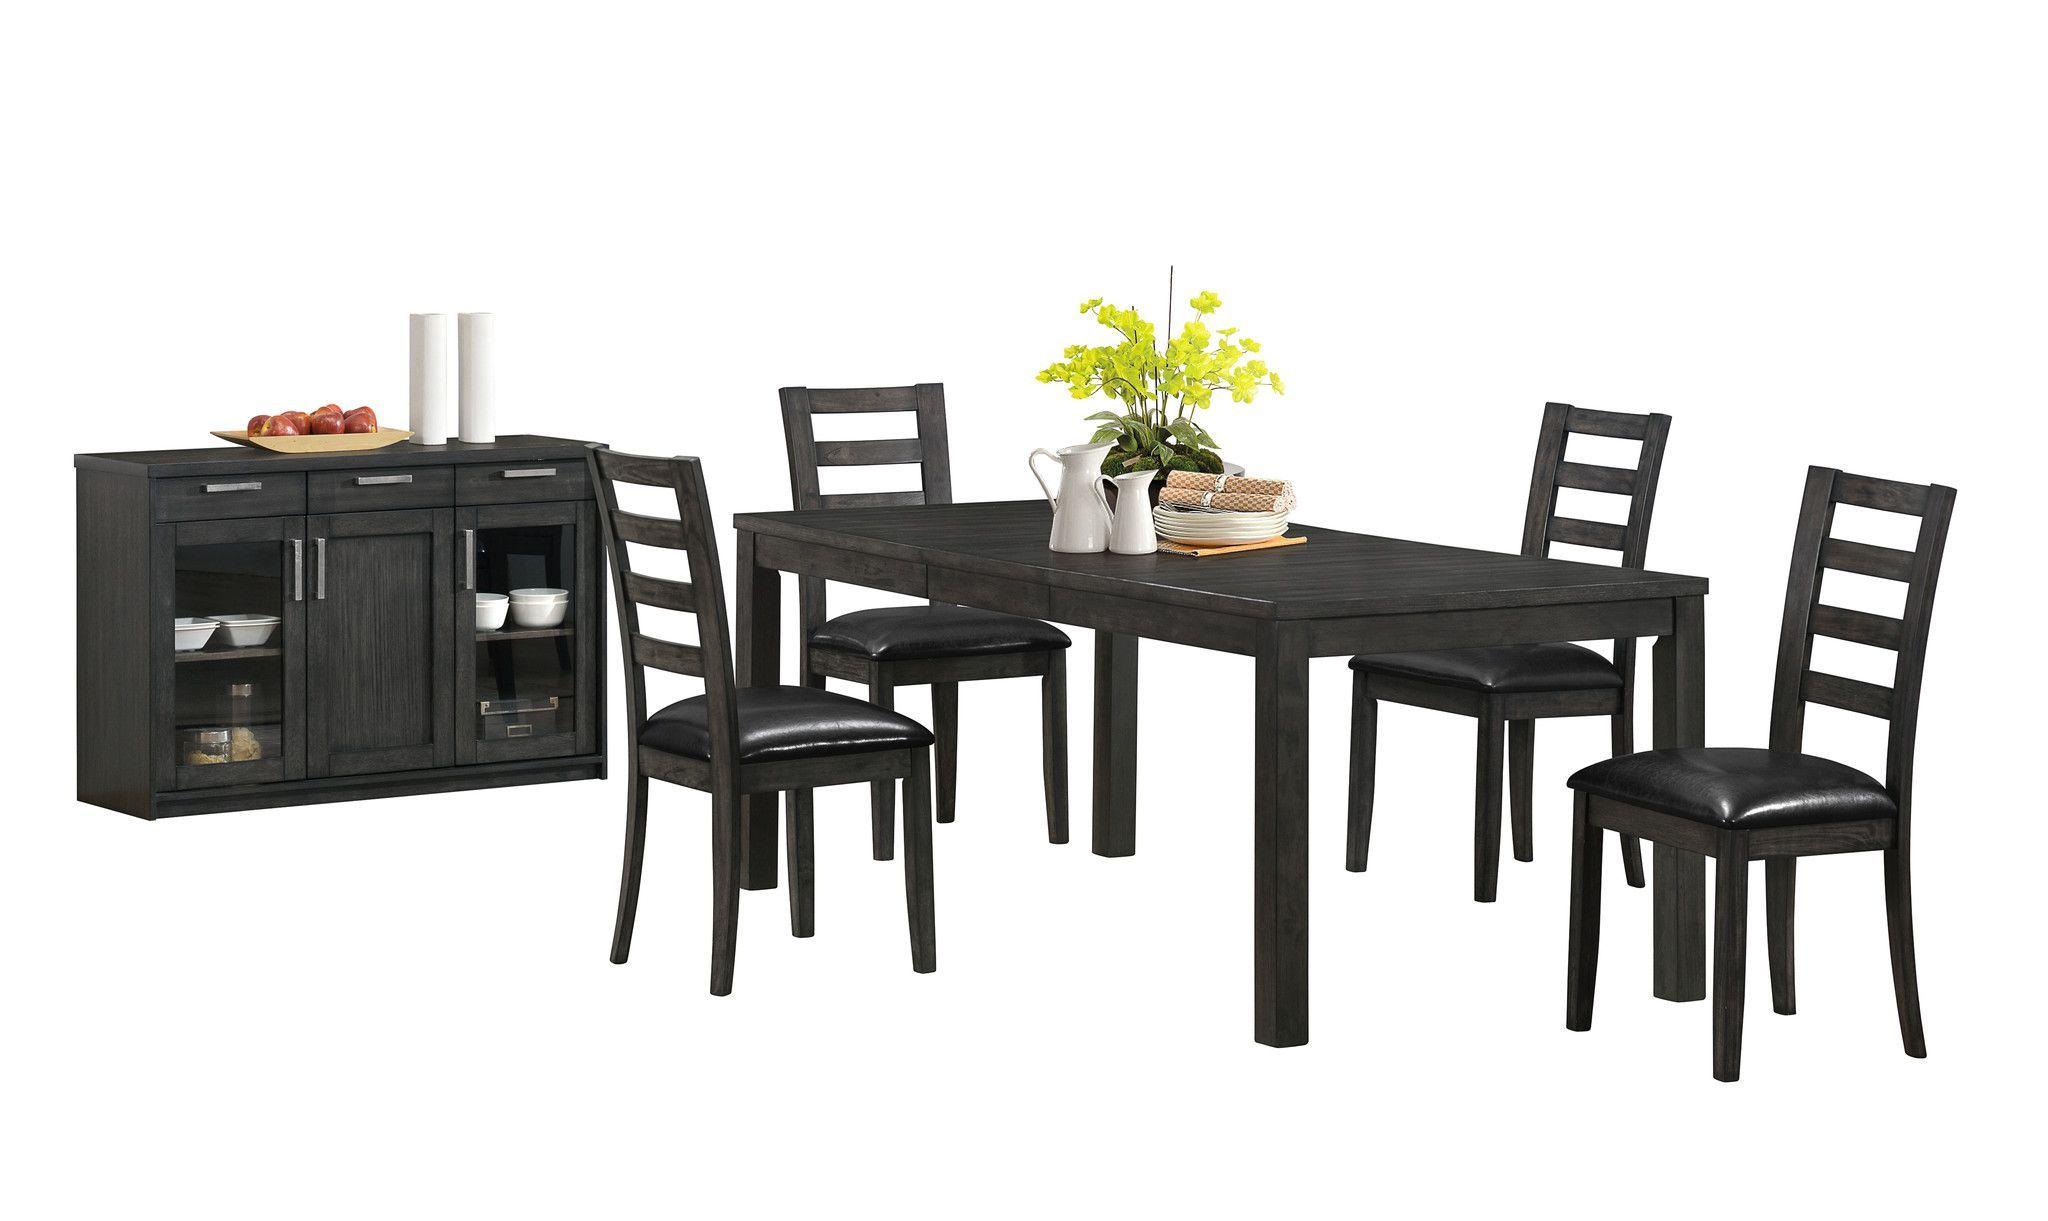 Charcoal Grey 38 X 60 X 78 Veneer Top Dining Table Dining Table With Leaf Casual Dining Table Table